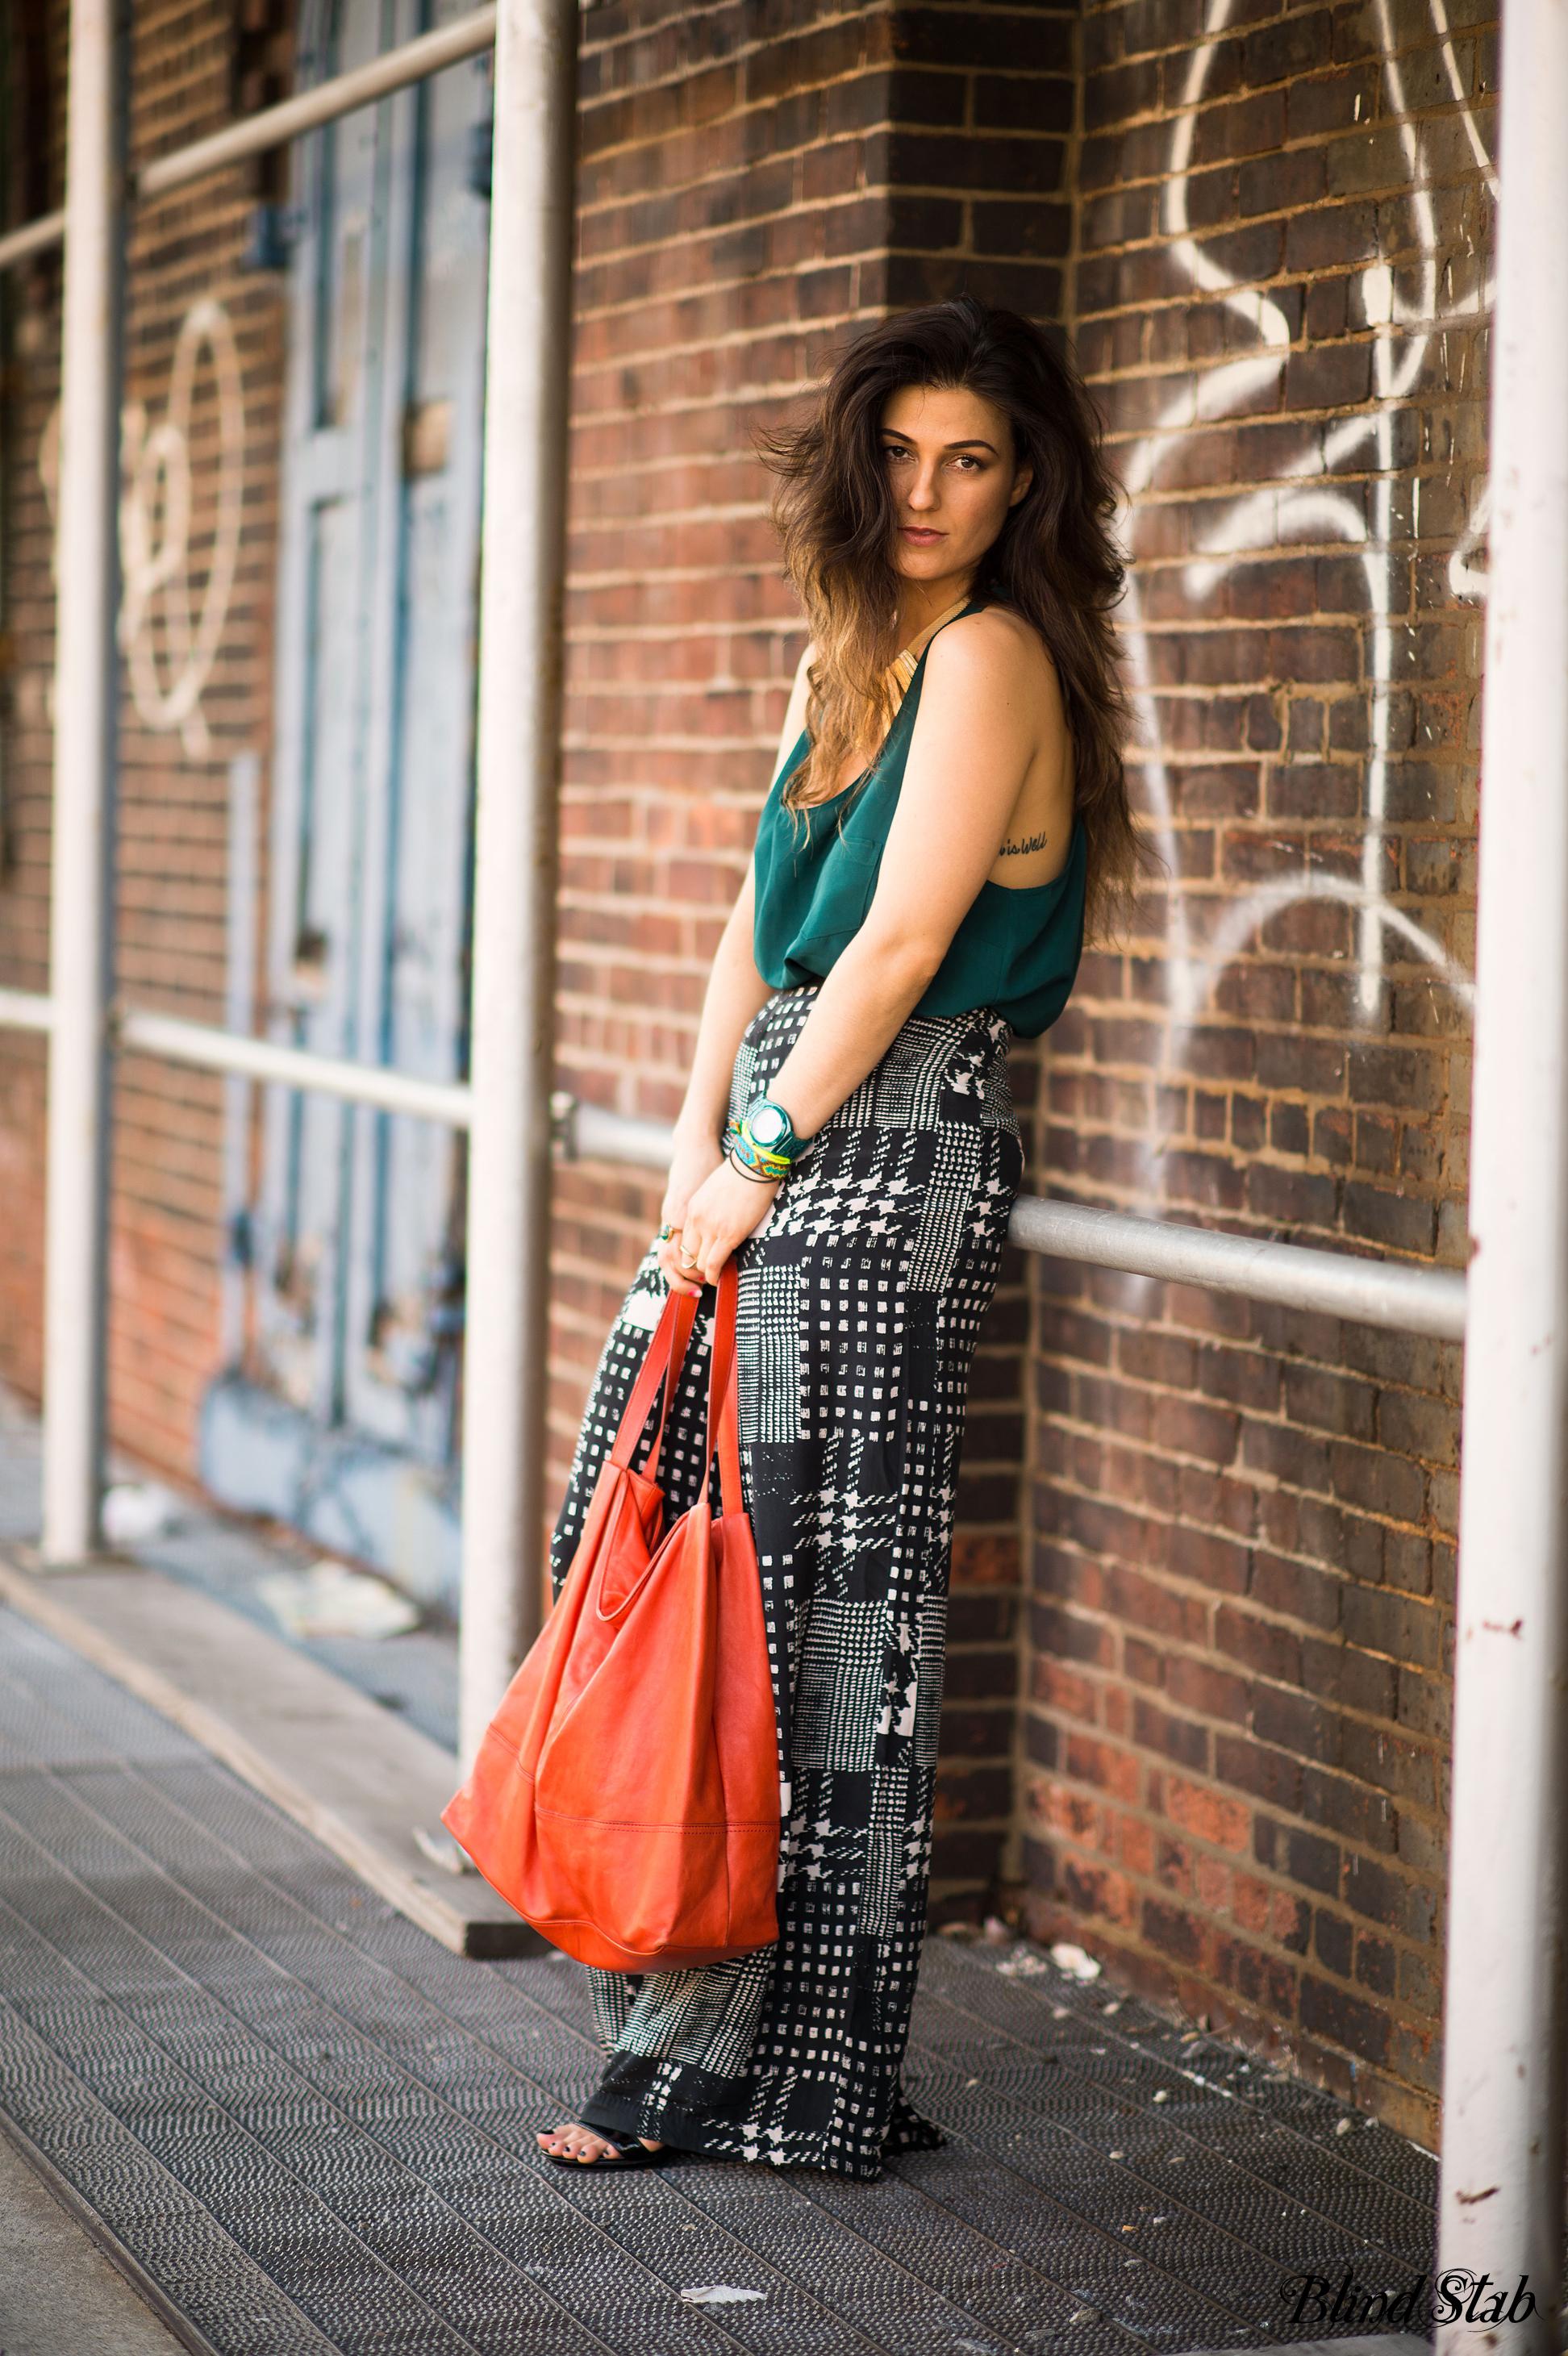 Blind-Stab-Dana-Suchow-Brooklyn-New-York-Spring-3-Wide-Leg-Pattern-Pants